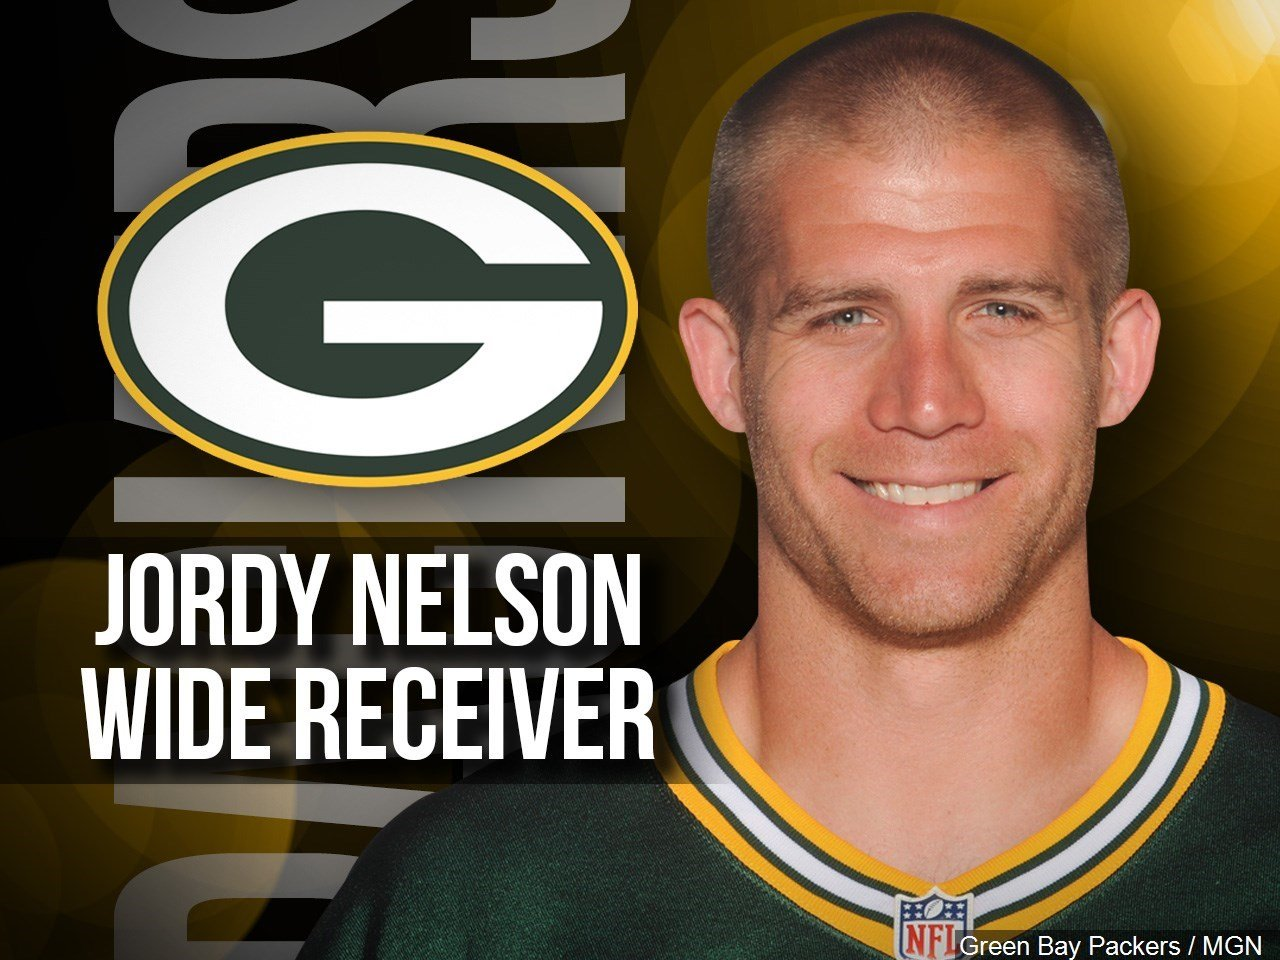 NFL Jerseys NFL - Packers - WAOW - Newsline 9, Wausau News, Weather, Sports